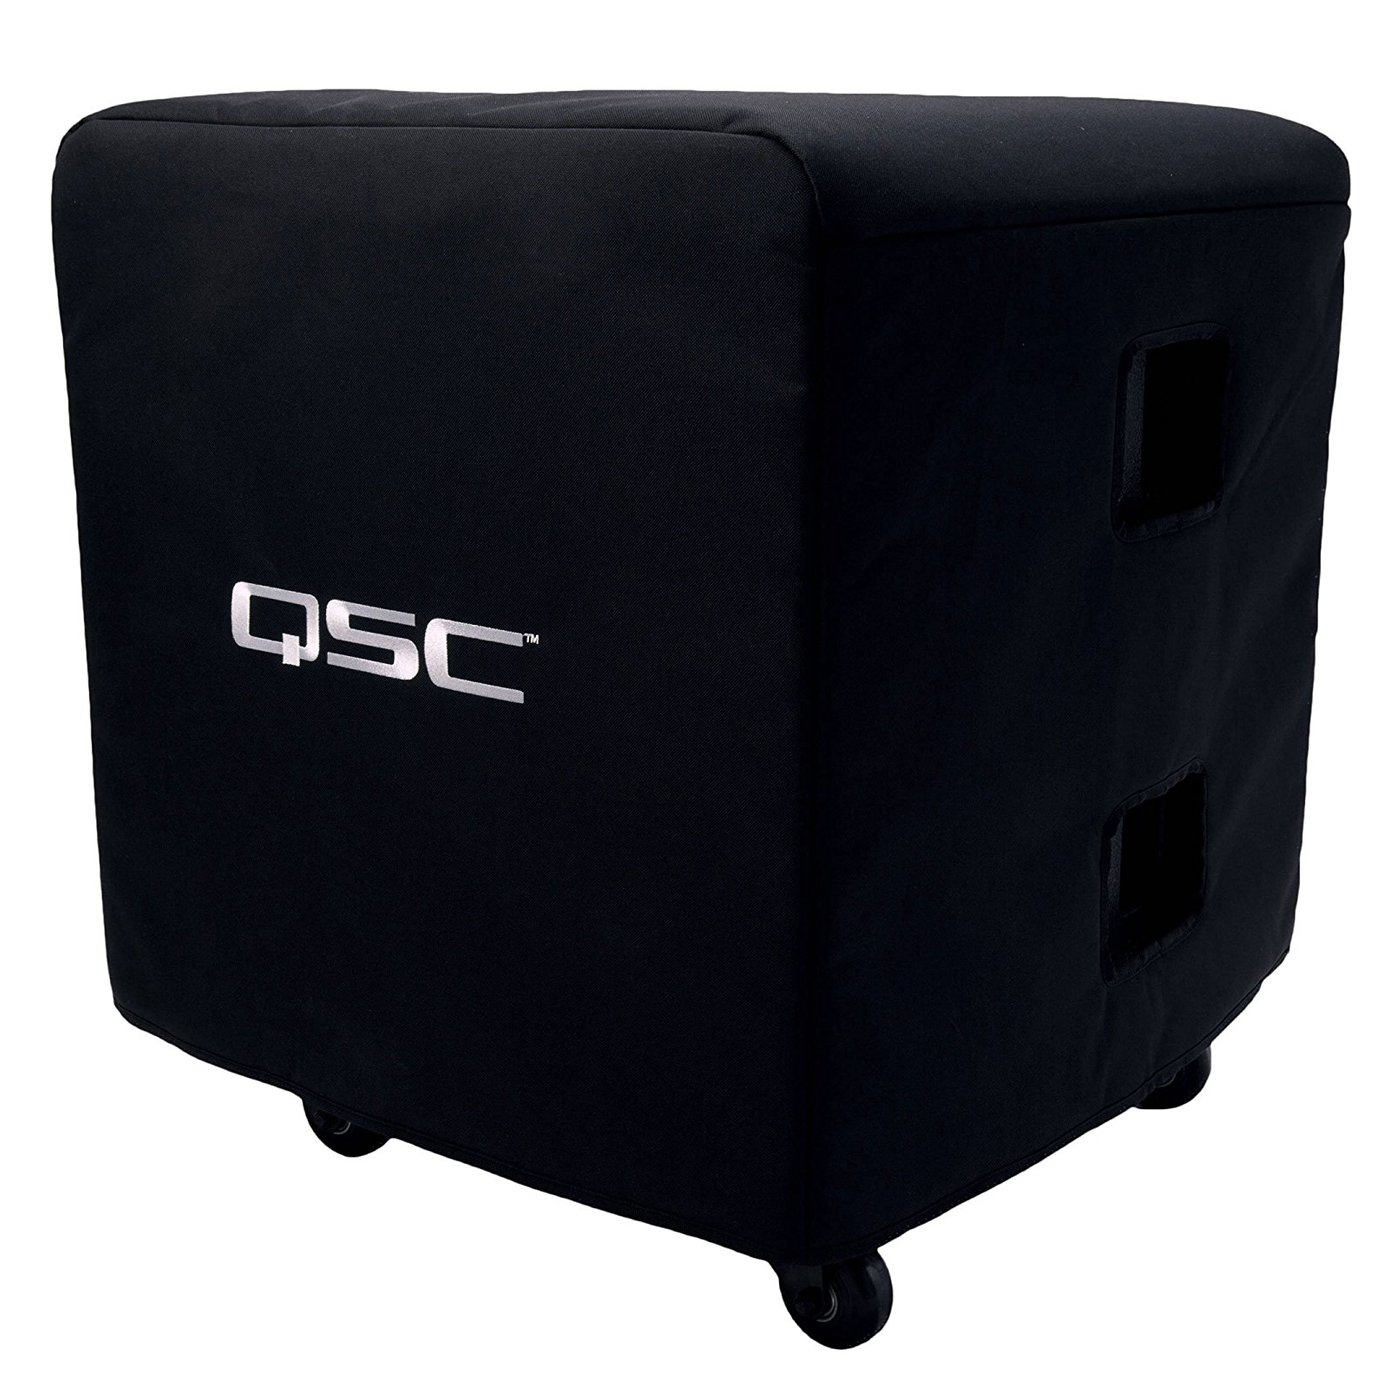 QSC ( キューエスシー ) E18SW用スピーカーカバー E18SW Cover B01M617EHL